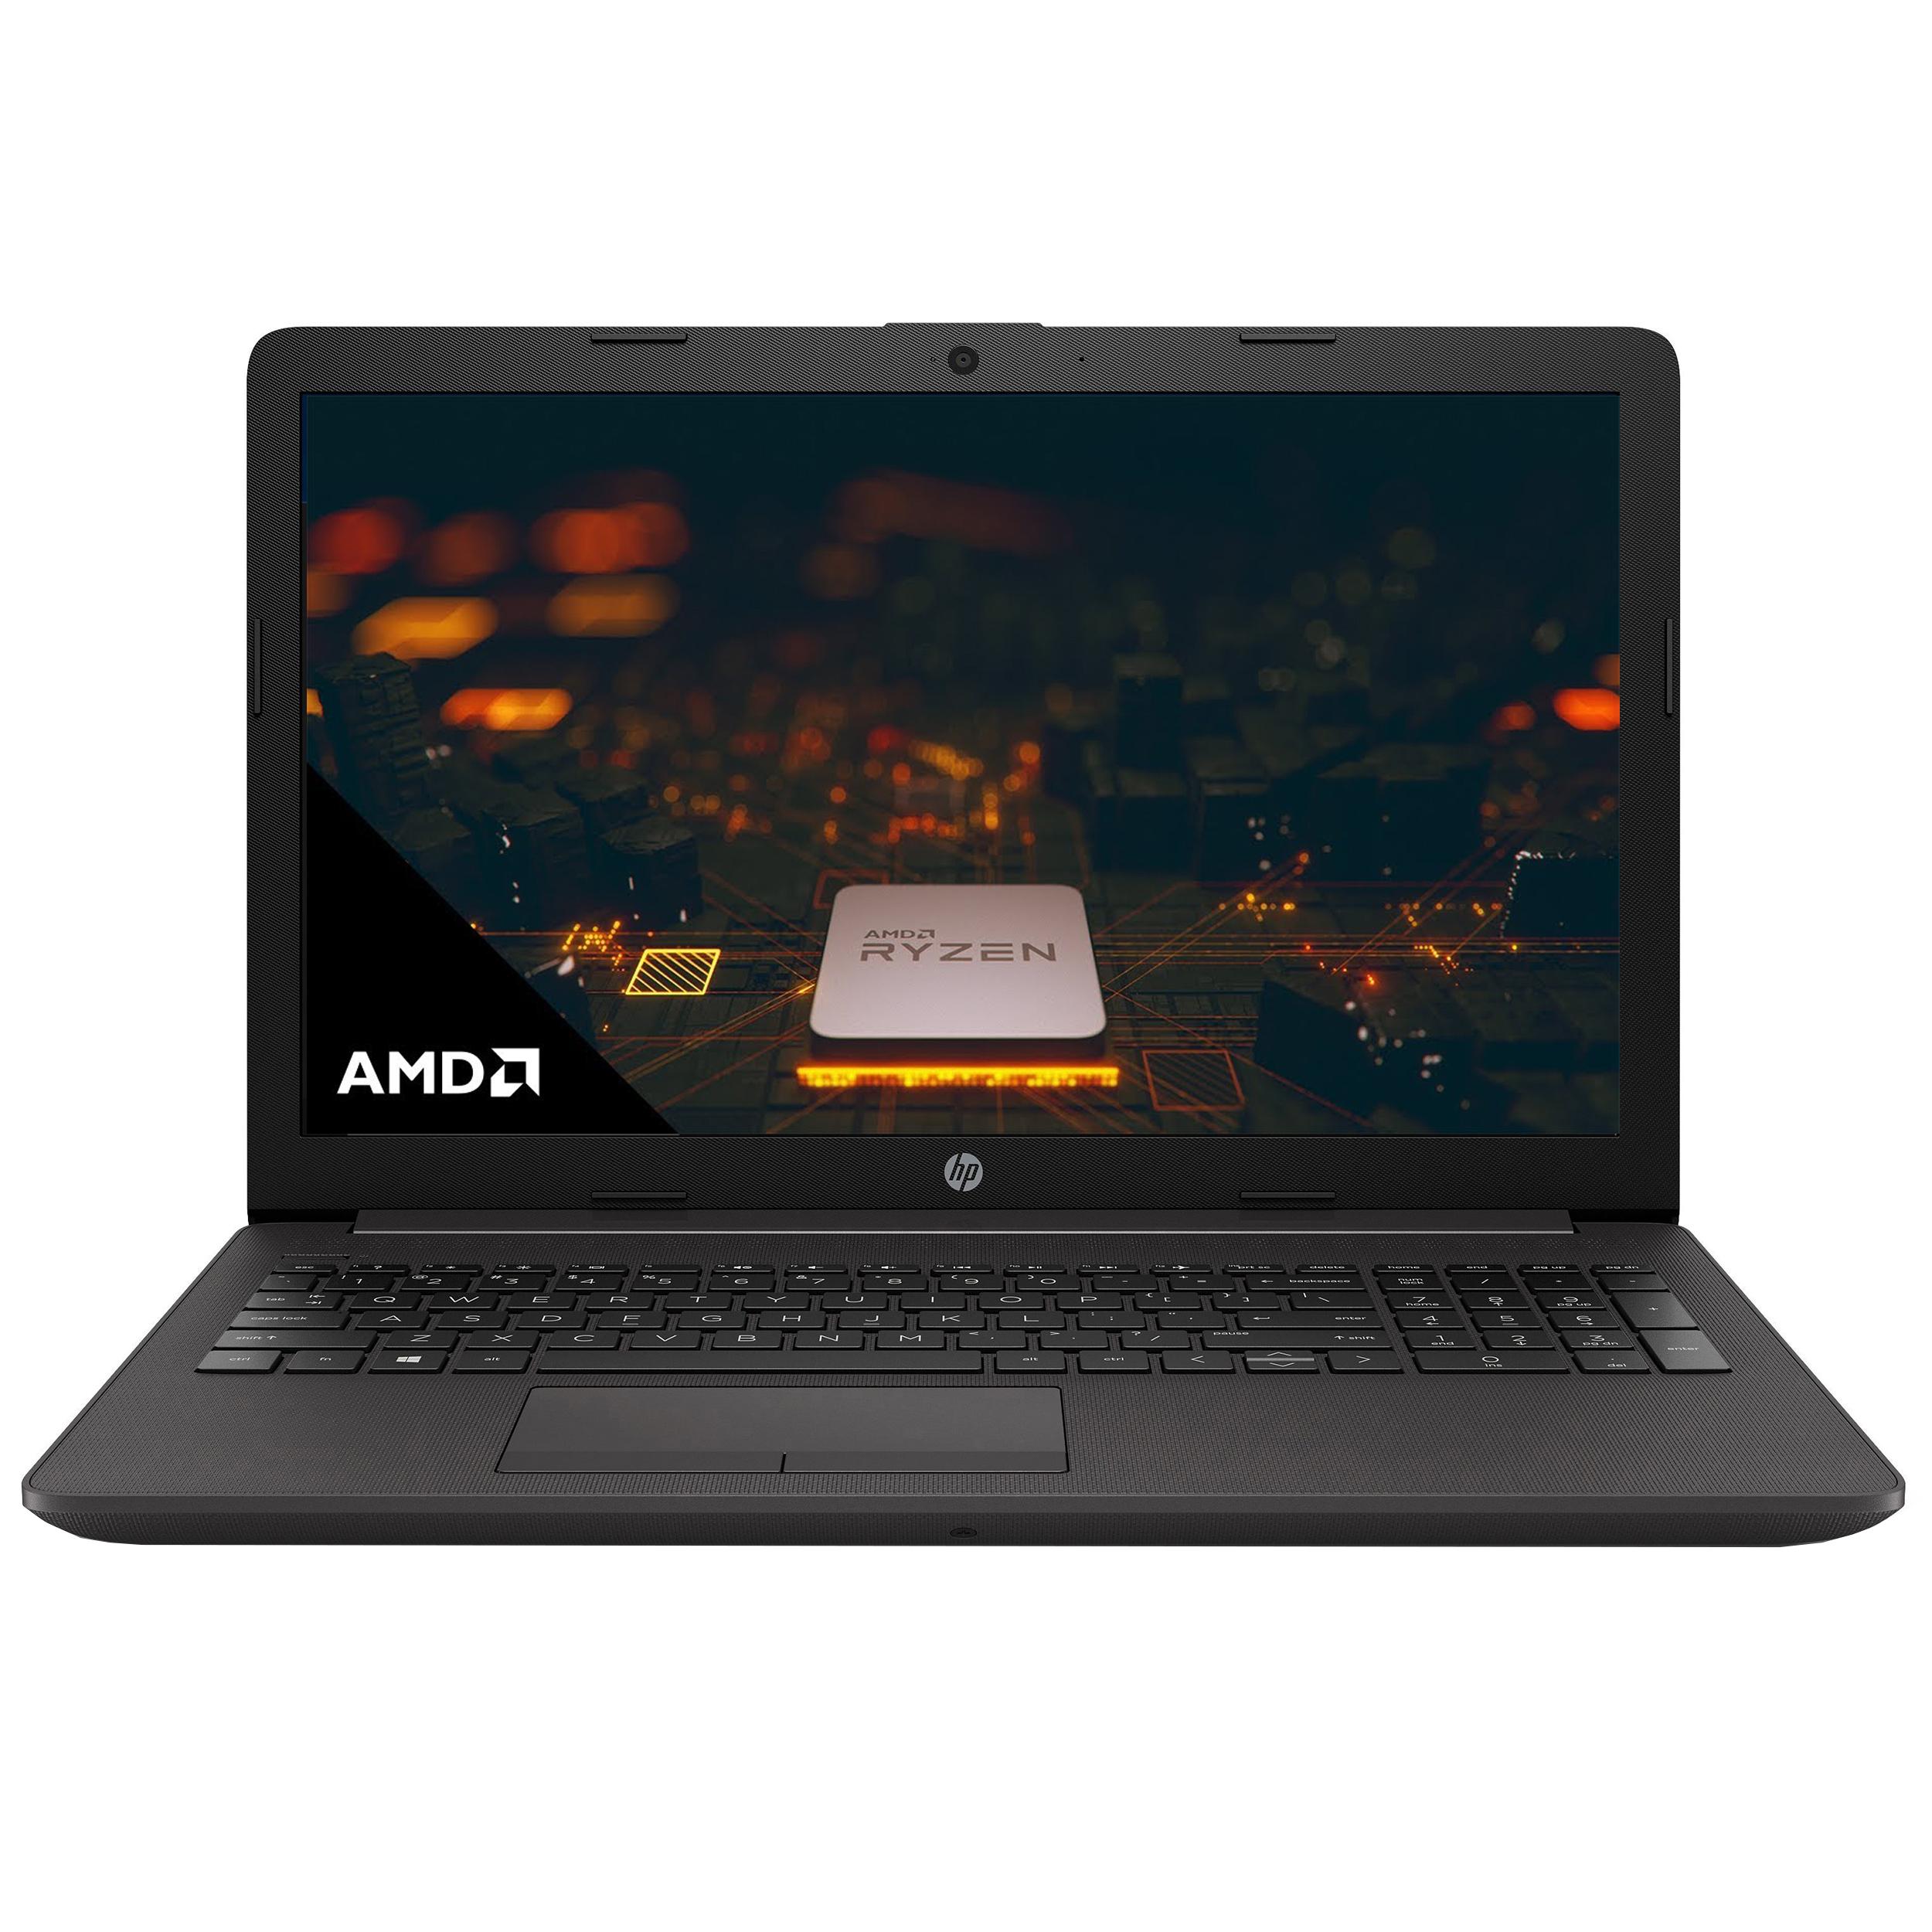 لپ تاپ 15.6 اینچی اچپی مدل 255 G7-R3A